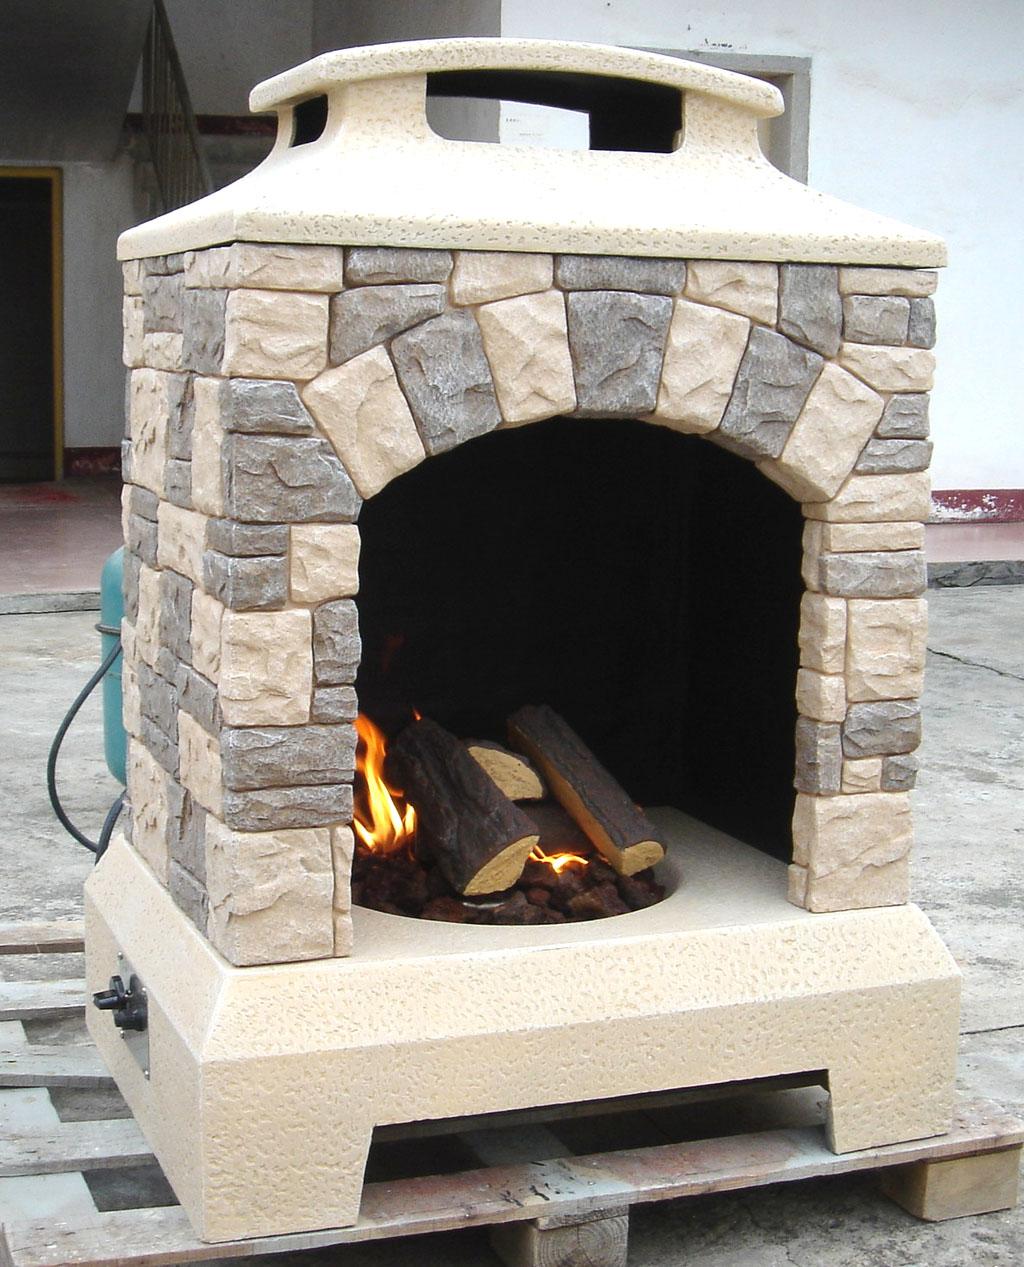 New 2016 Tuscan Stone Style Outdoor Backyard Fireplace Gas Fire Pit w Fire Logs  eBay